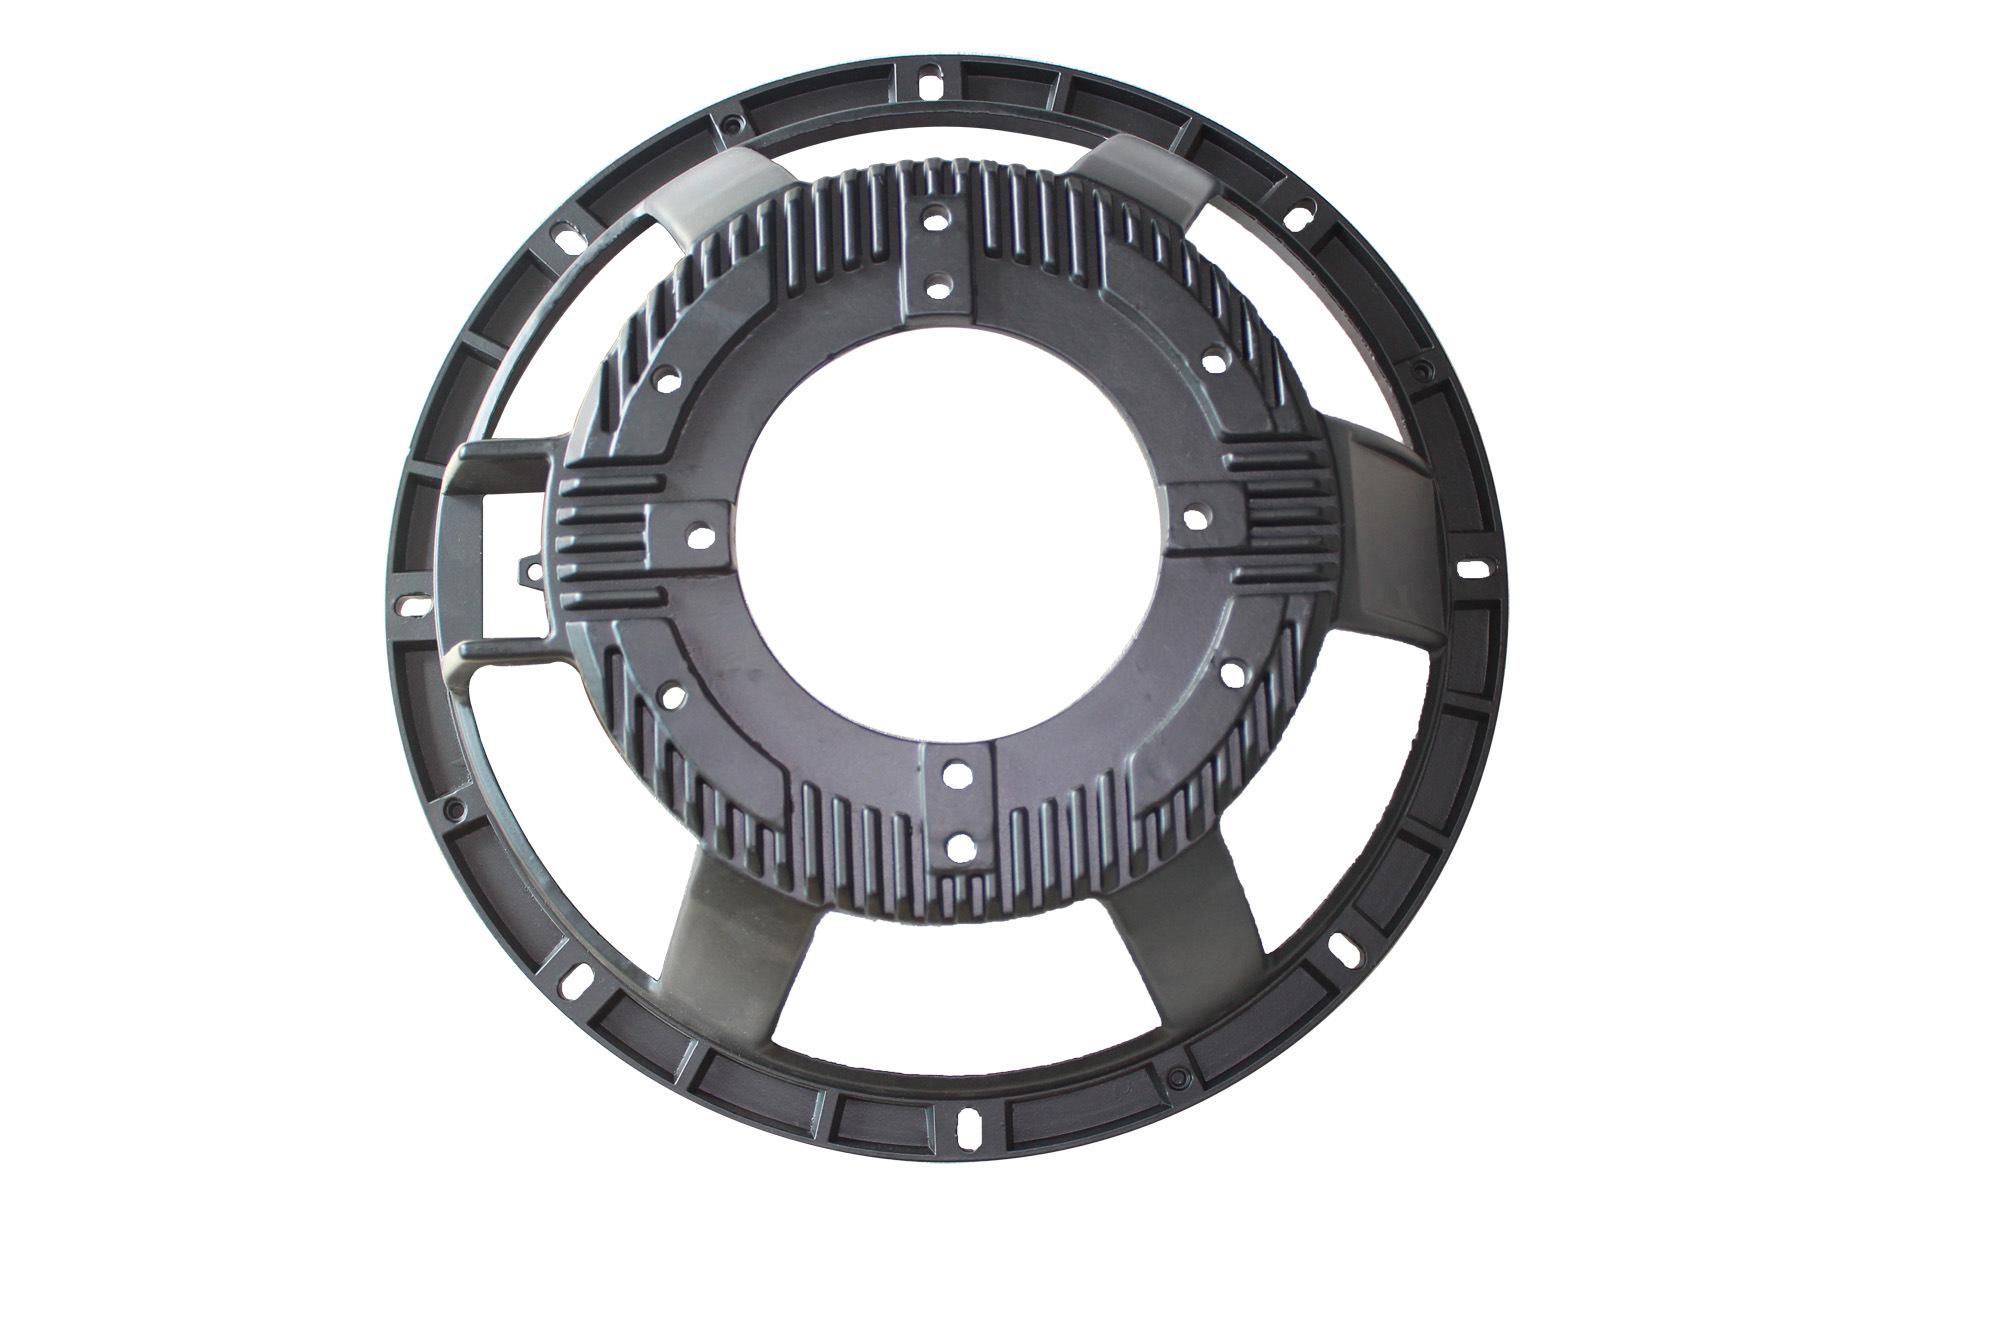 12inch Pressure Die Cast for Customised Aluminium Subwoofer Parts-PA Speaker Frame